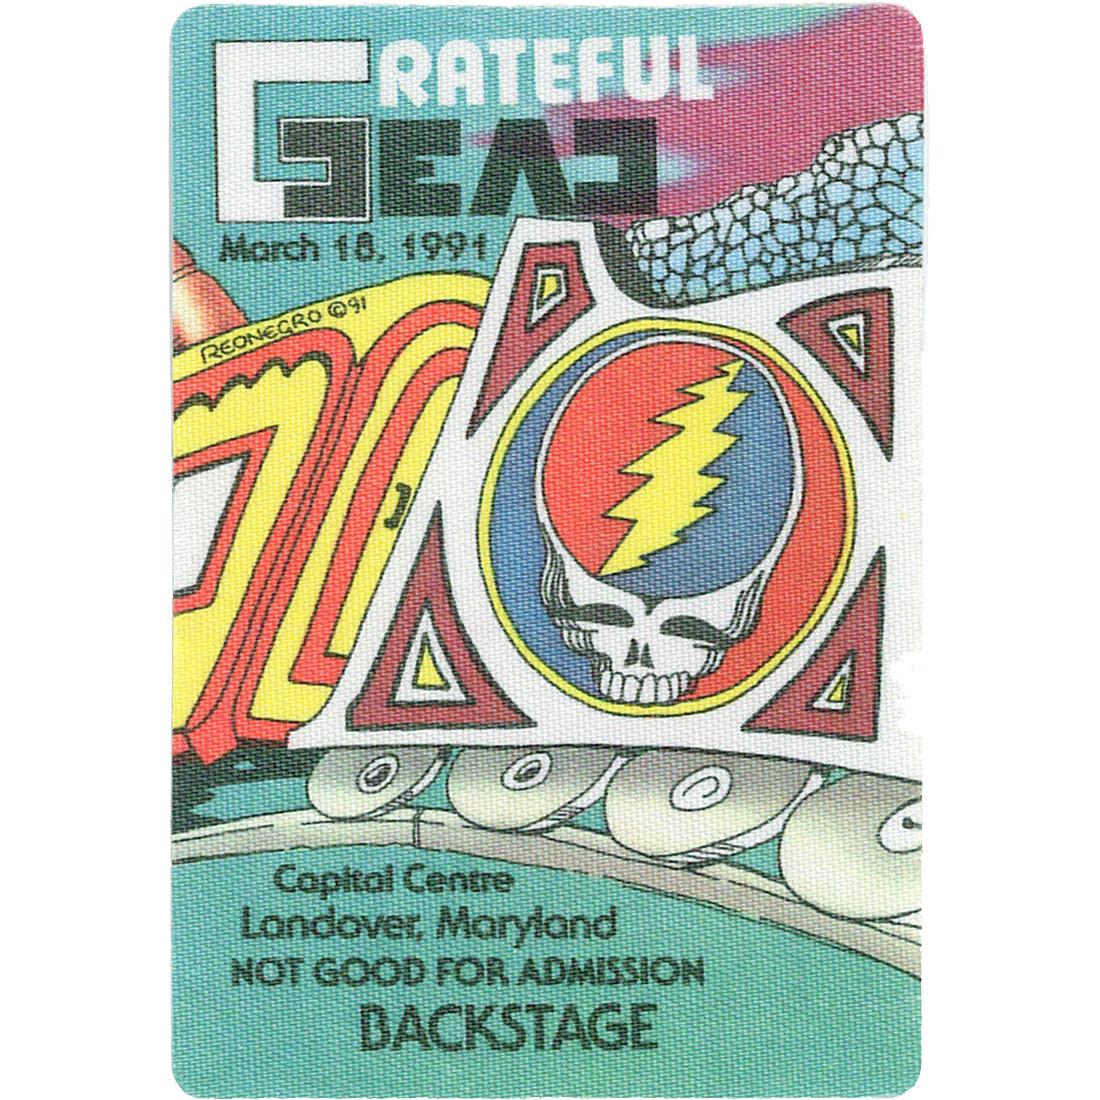 Grateful Dead 1991 03-18 Backstage Pass